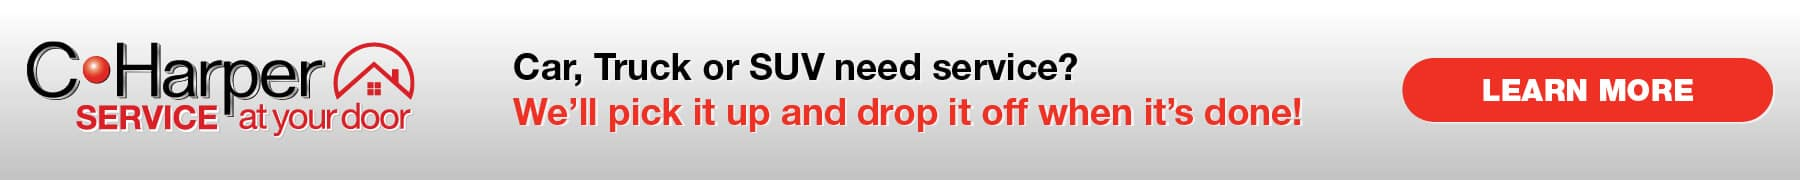 https://di-uploads-pod14.dealerinspire.com/charpercdjrofconnellsville/uploads/2020/03/CH_03.20_Coronavirus_CDJRPENCIL_v2.jpg